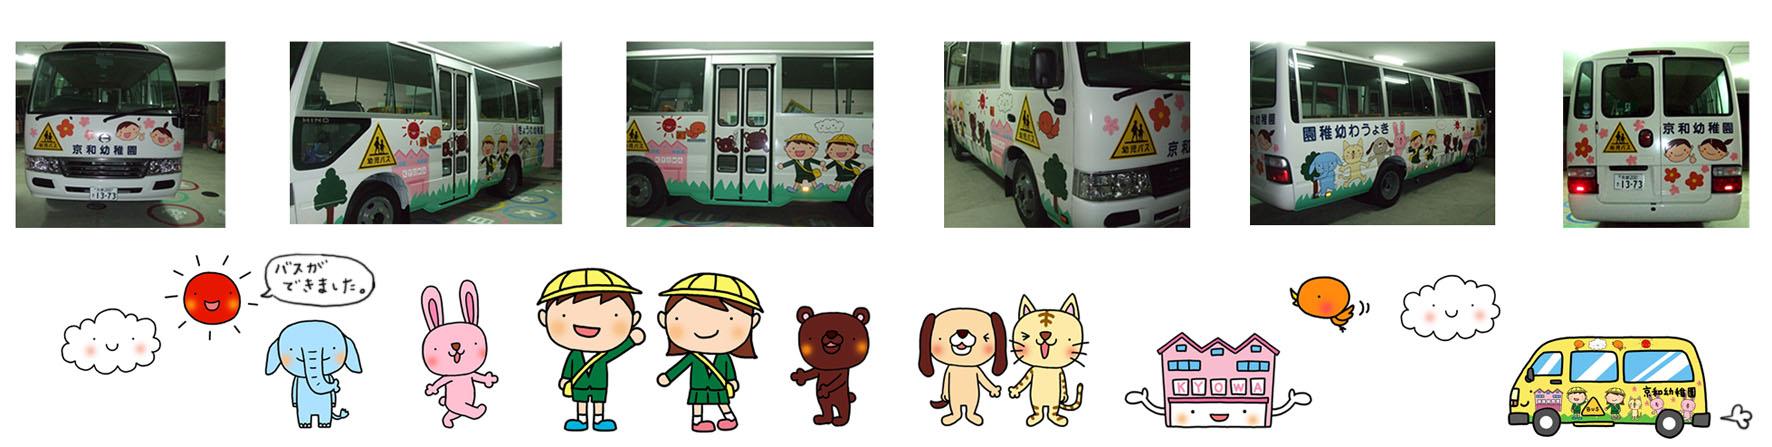 Bus_image_2